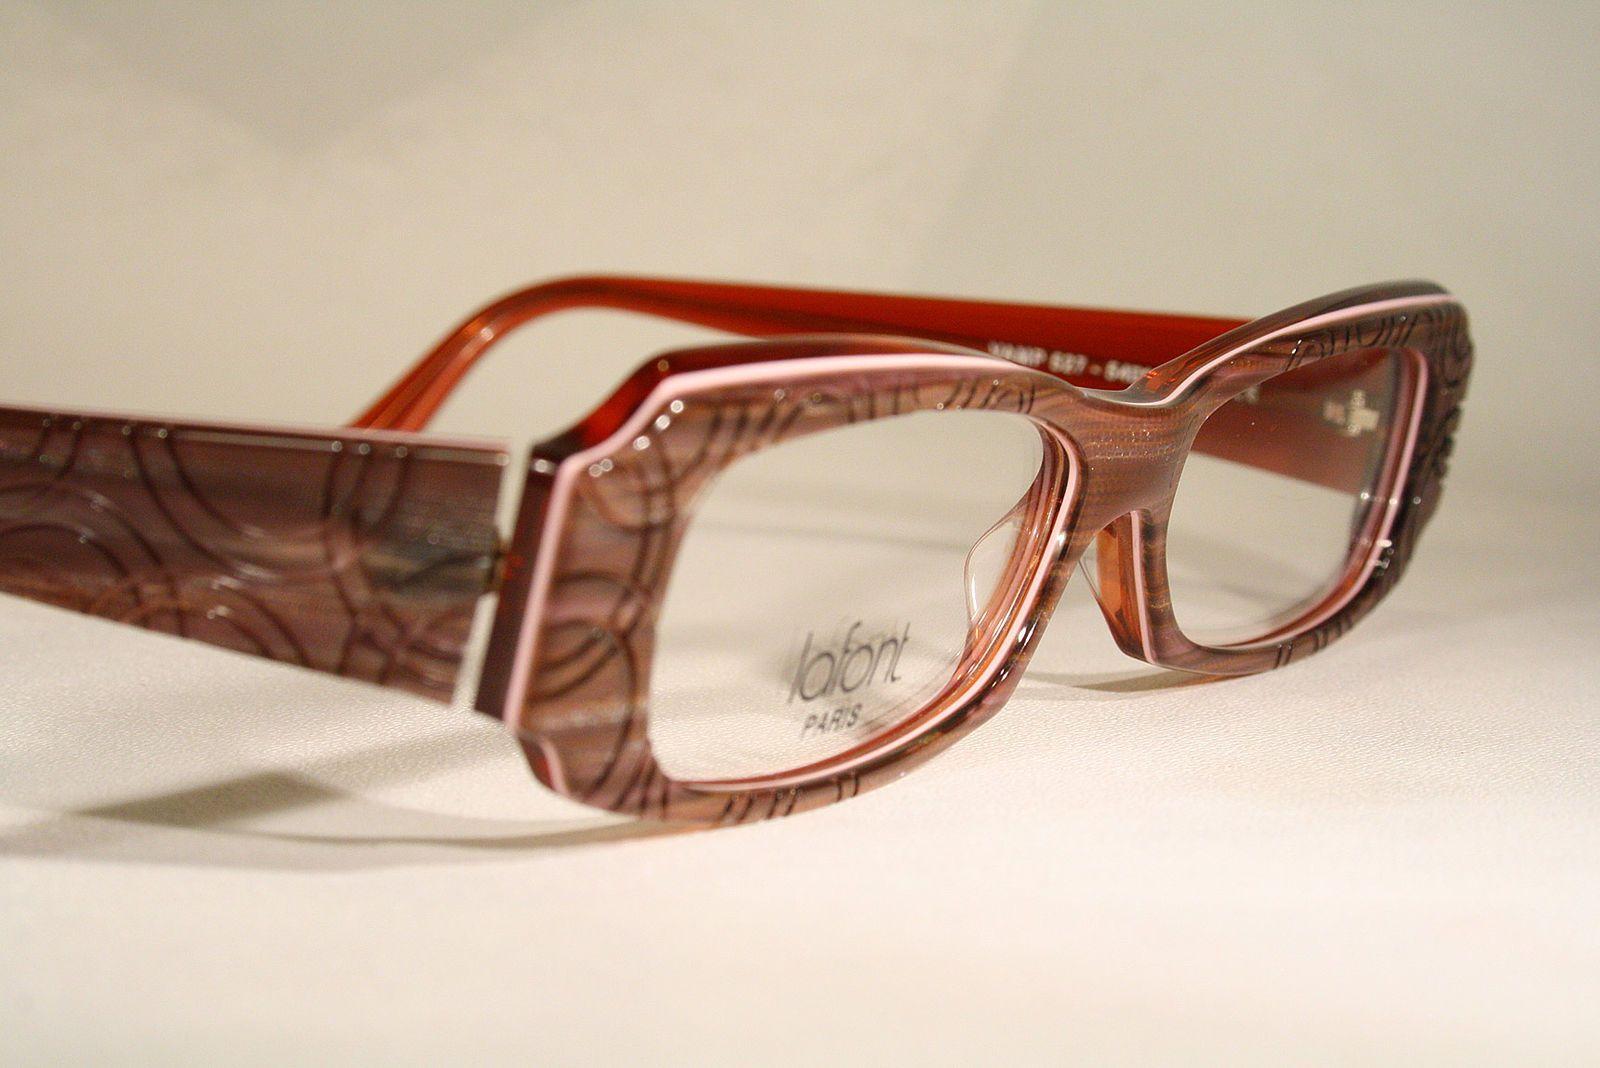 d48336b00883 New LAFONT  VAMP  Exotic Wild Unique Plastic Optical Eyeglasses Frames X- Large